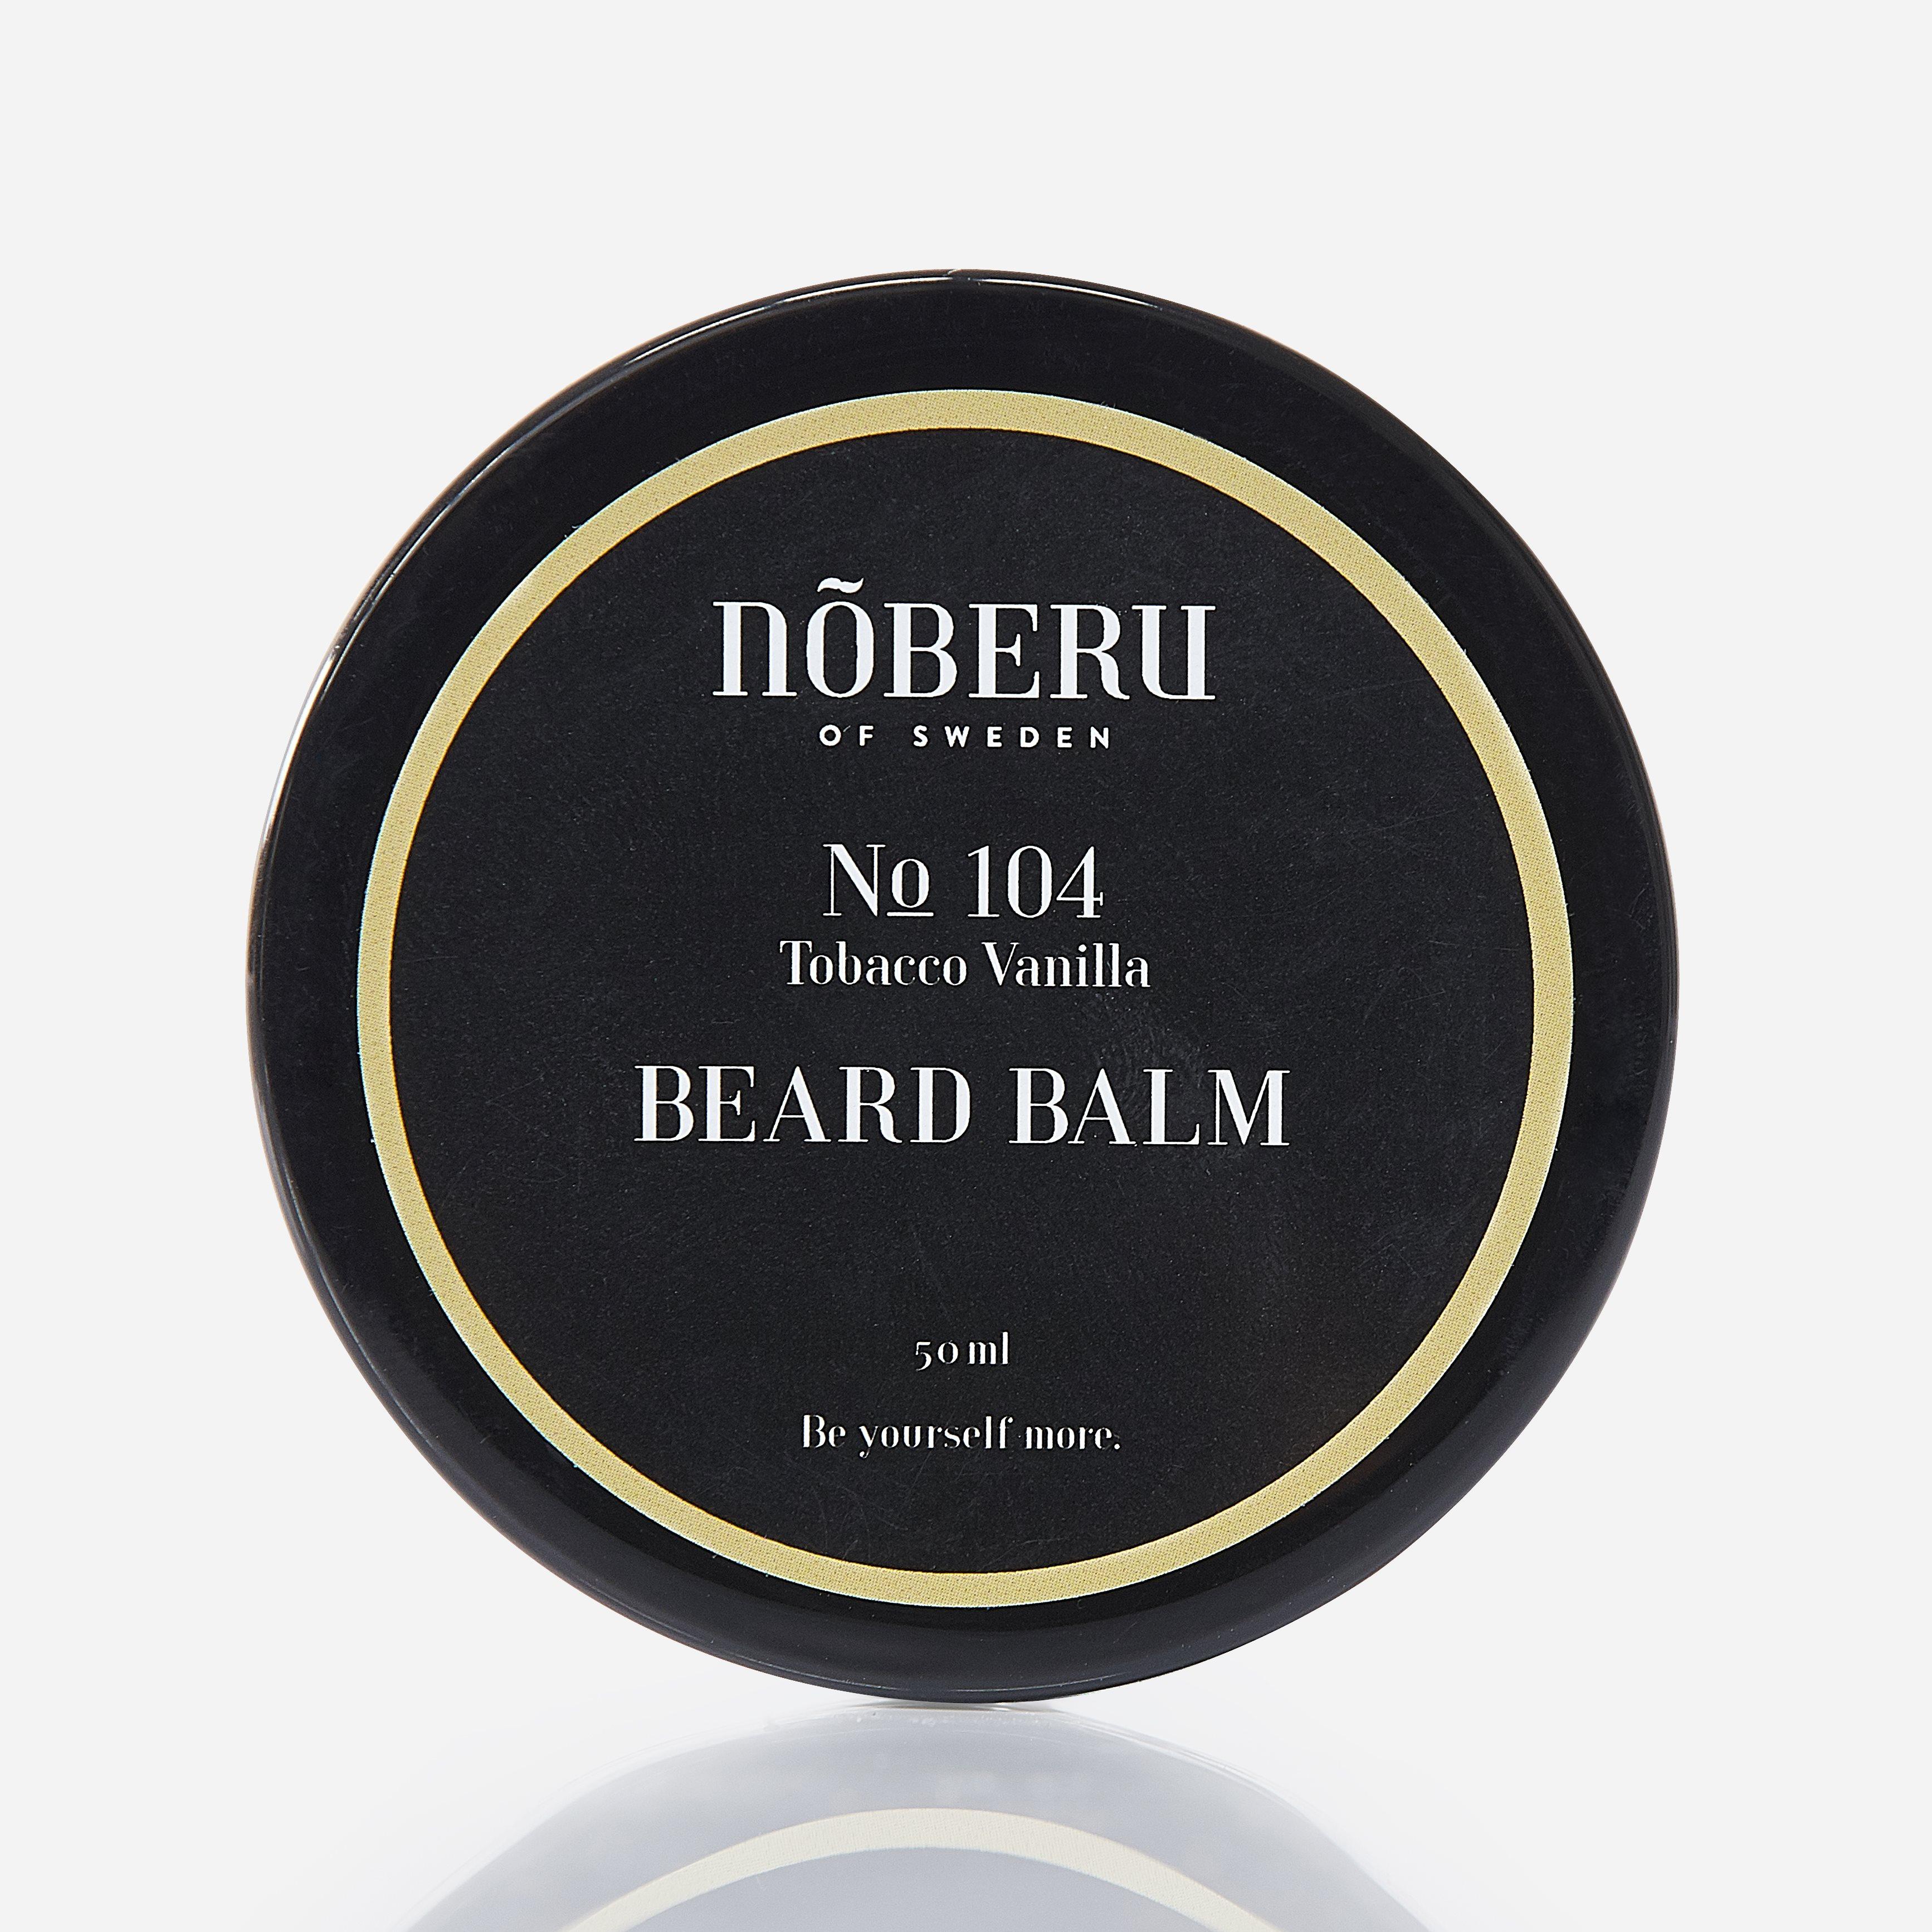 NOBERU Tobacco Vanilla Beard Balm 50 ml